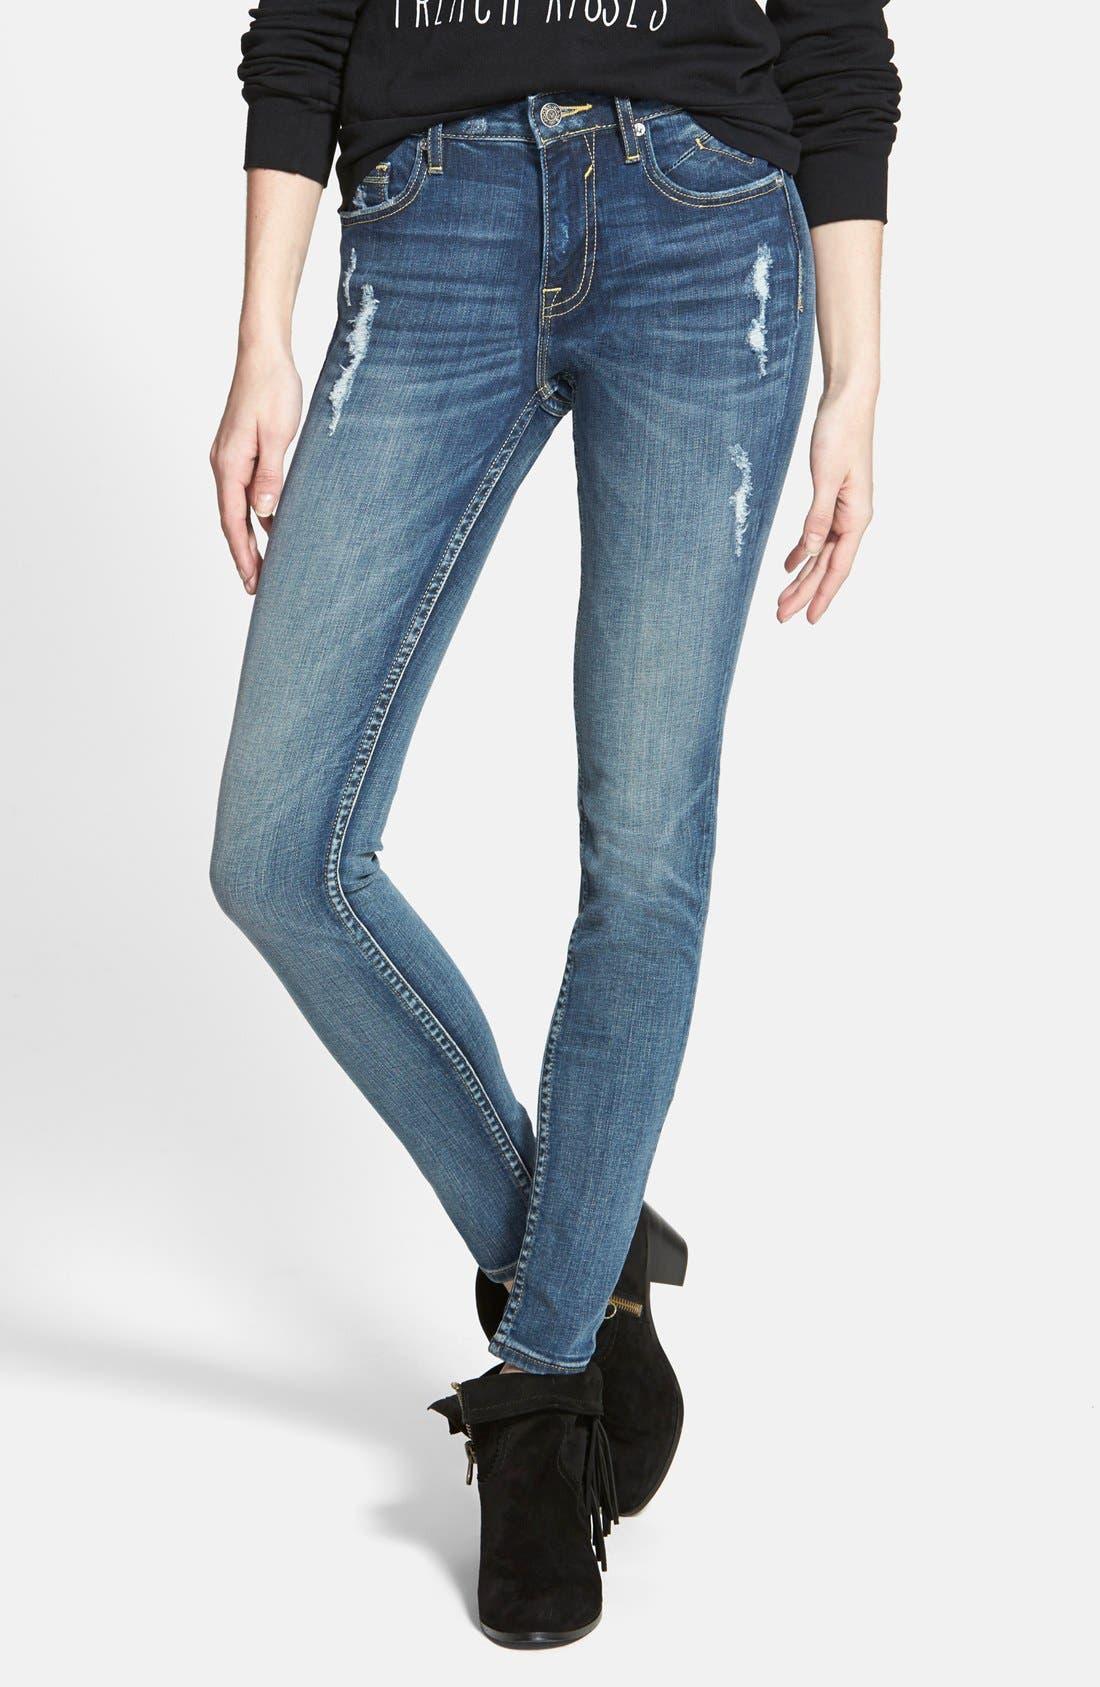 Alternate Image 1 Selected - Vigoss 'Dublin' Distressed Skinny Jeans (Medium Wash)